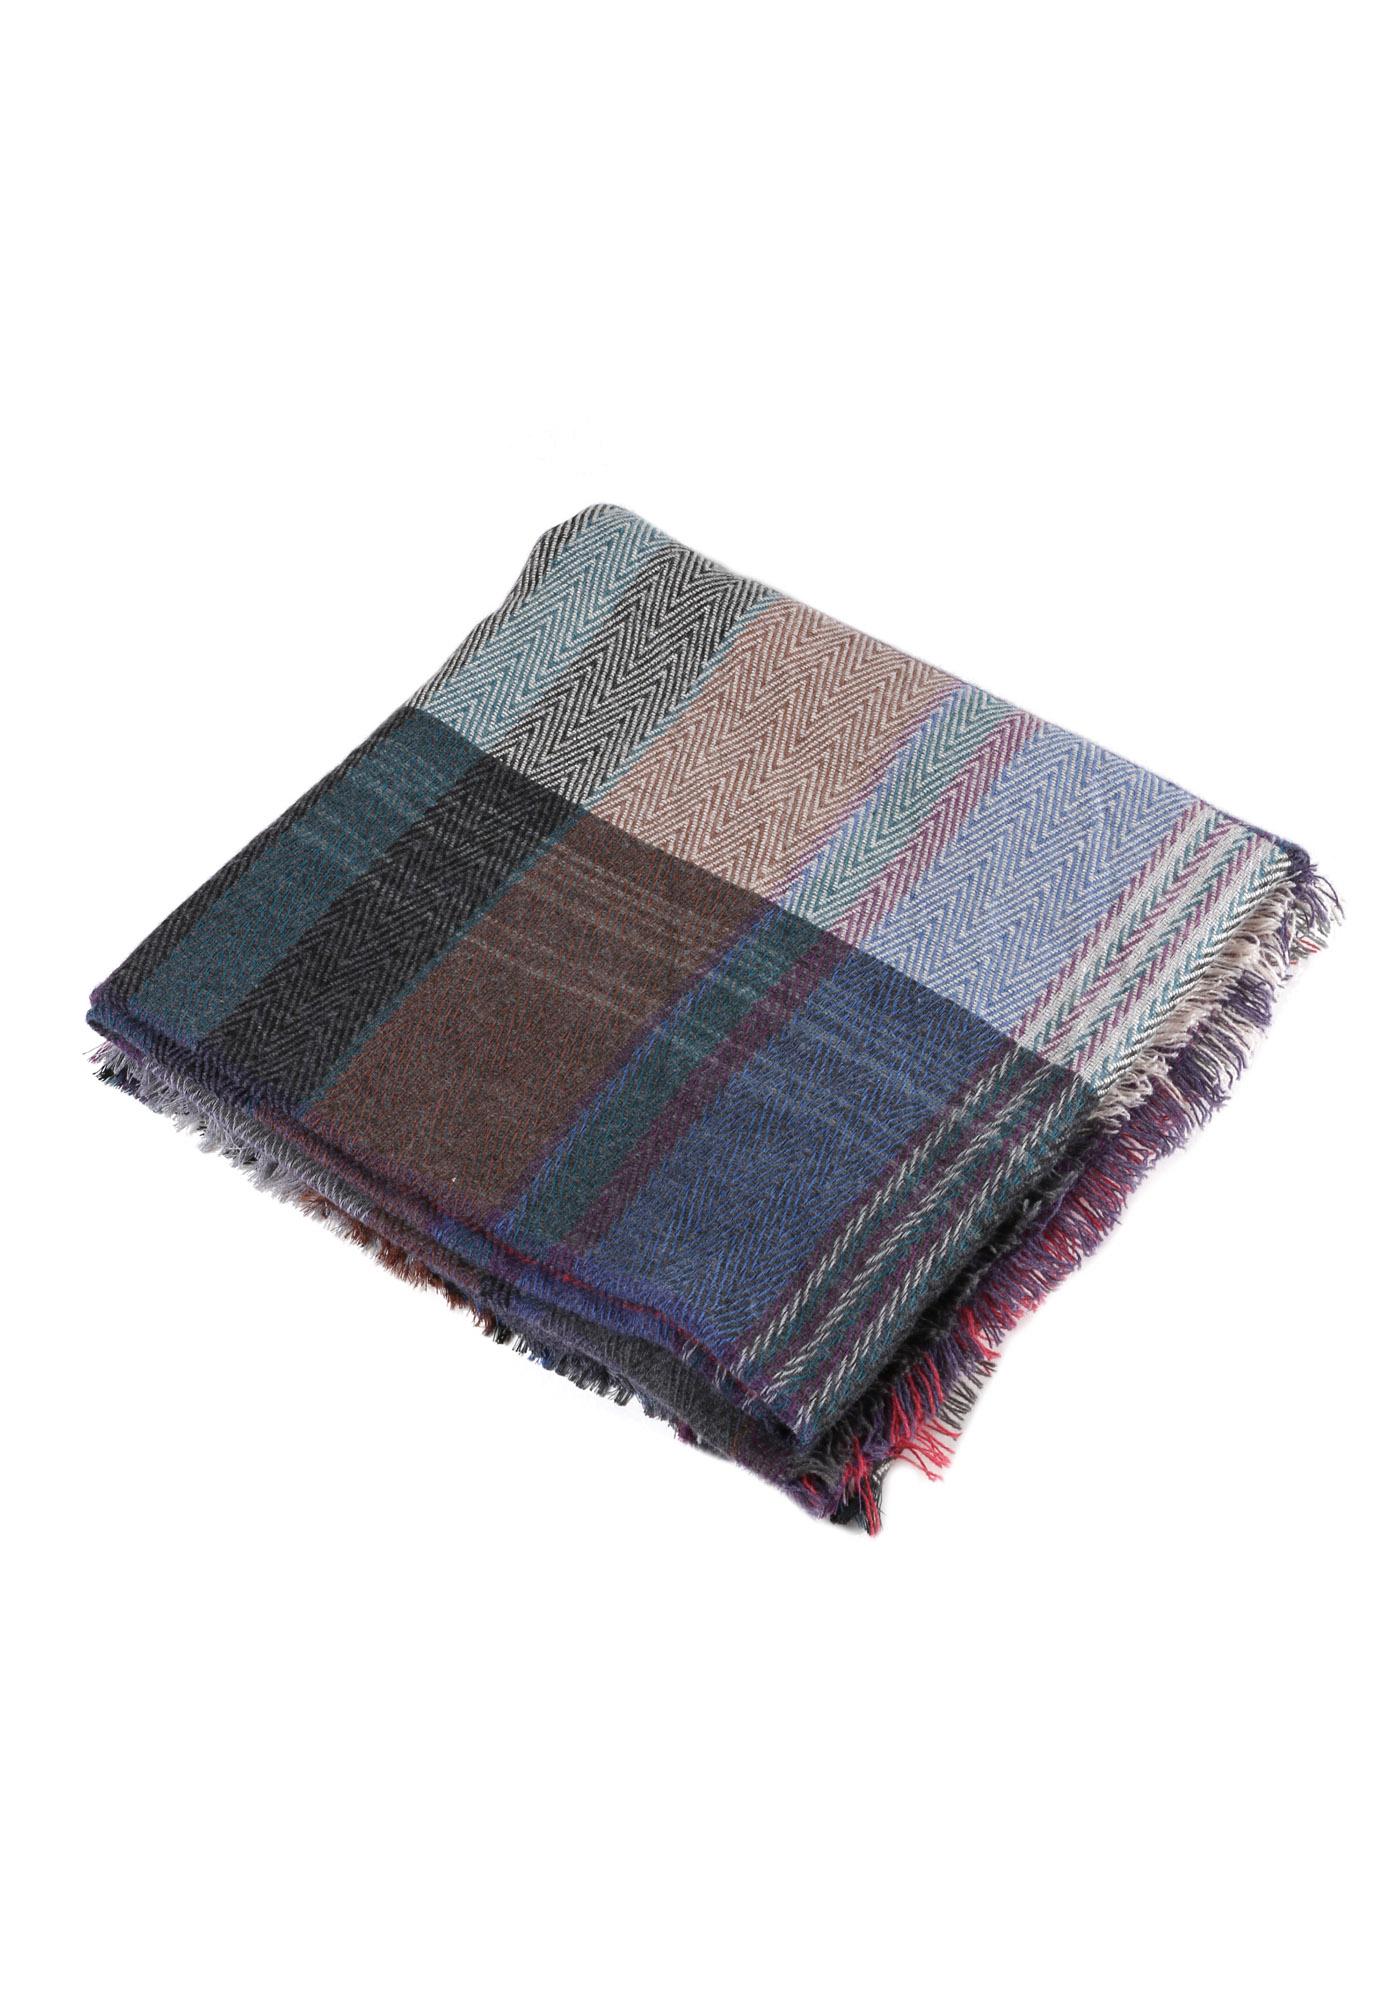 7ec4ddbf3e5eb Women's Plaid Blanket Scarf | Warehouse One